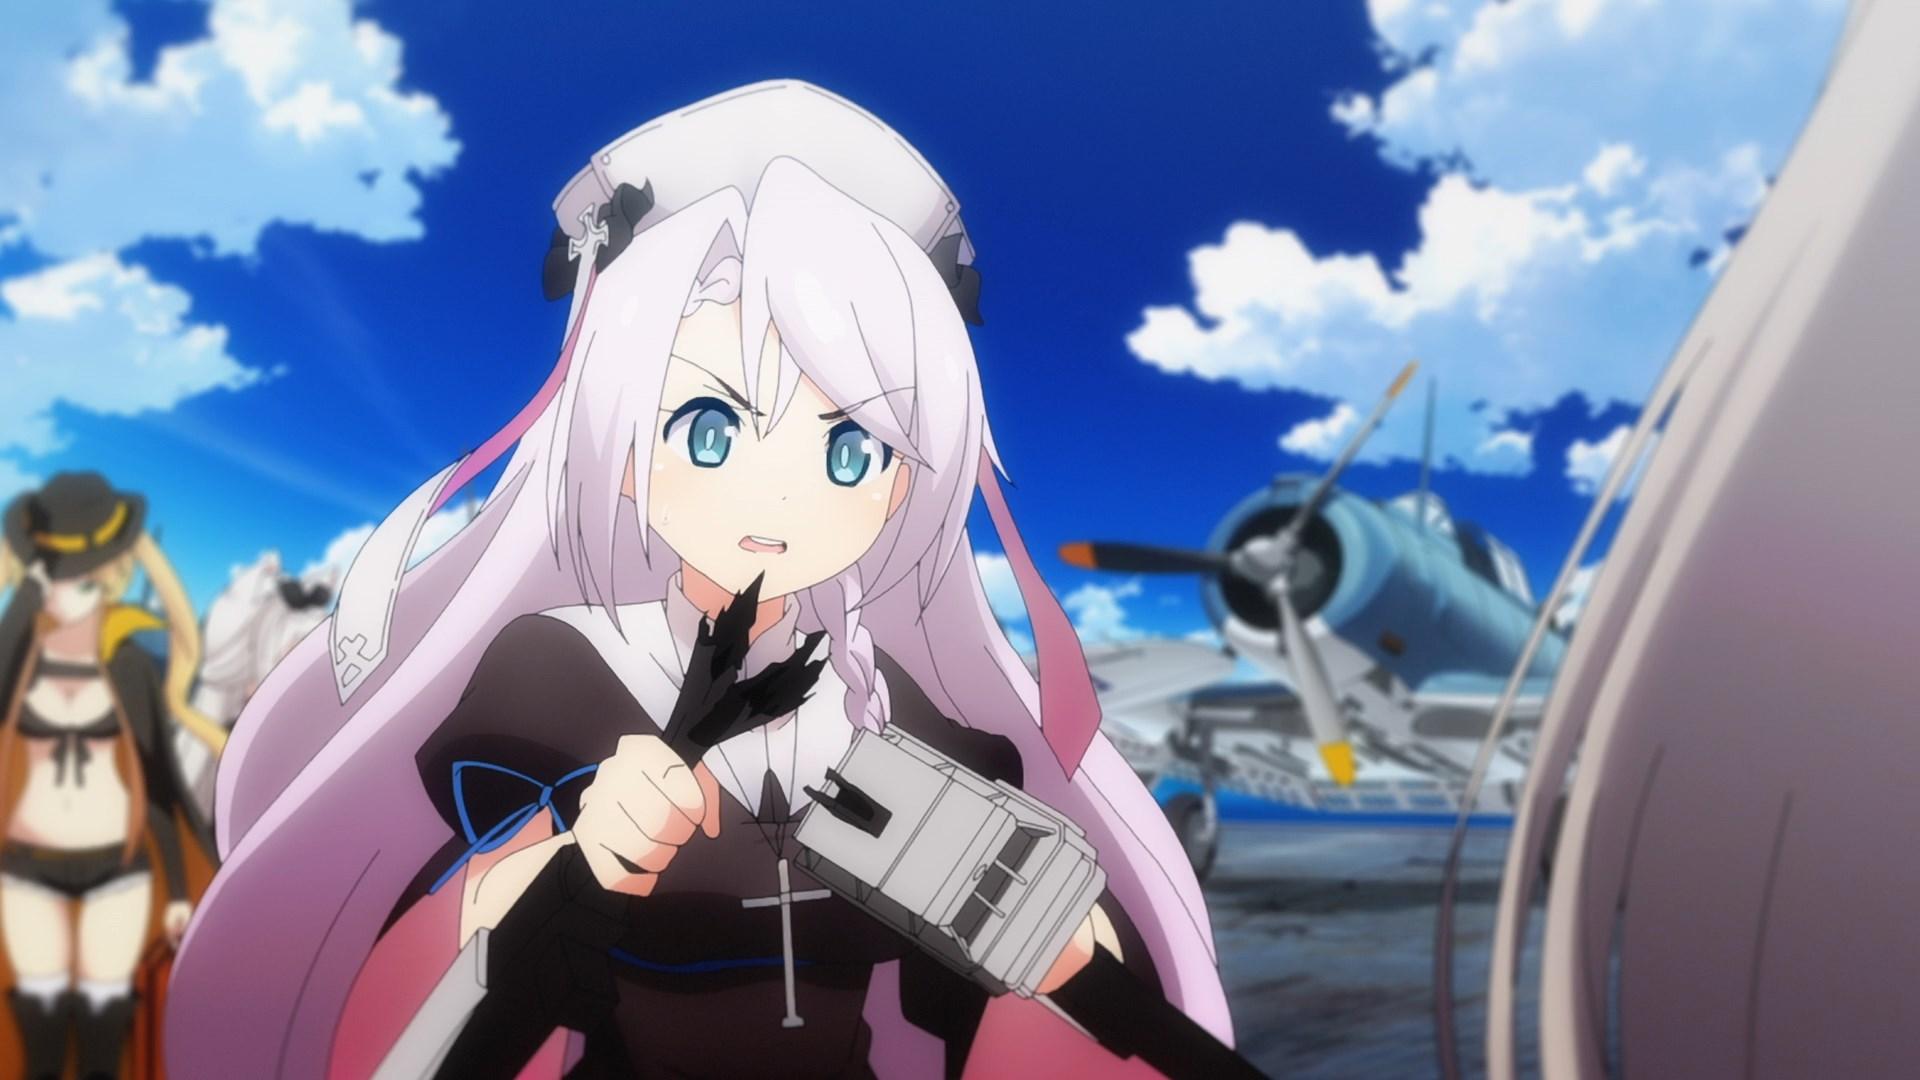 Azur Lane 03 A Ship Drama Azurlane Anime Astronerdboy S Anime Manga Blog Astronerdboy S Anime Manga Blog